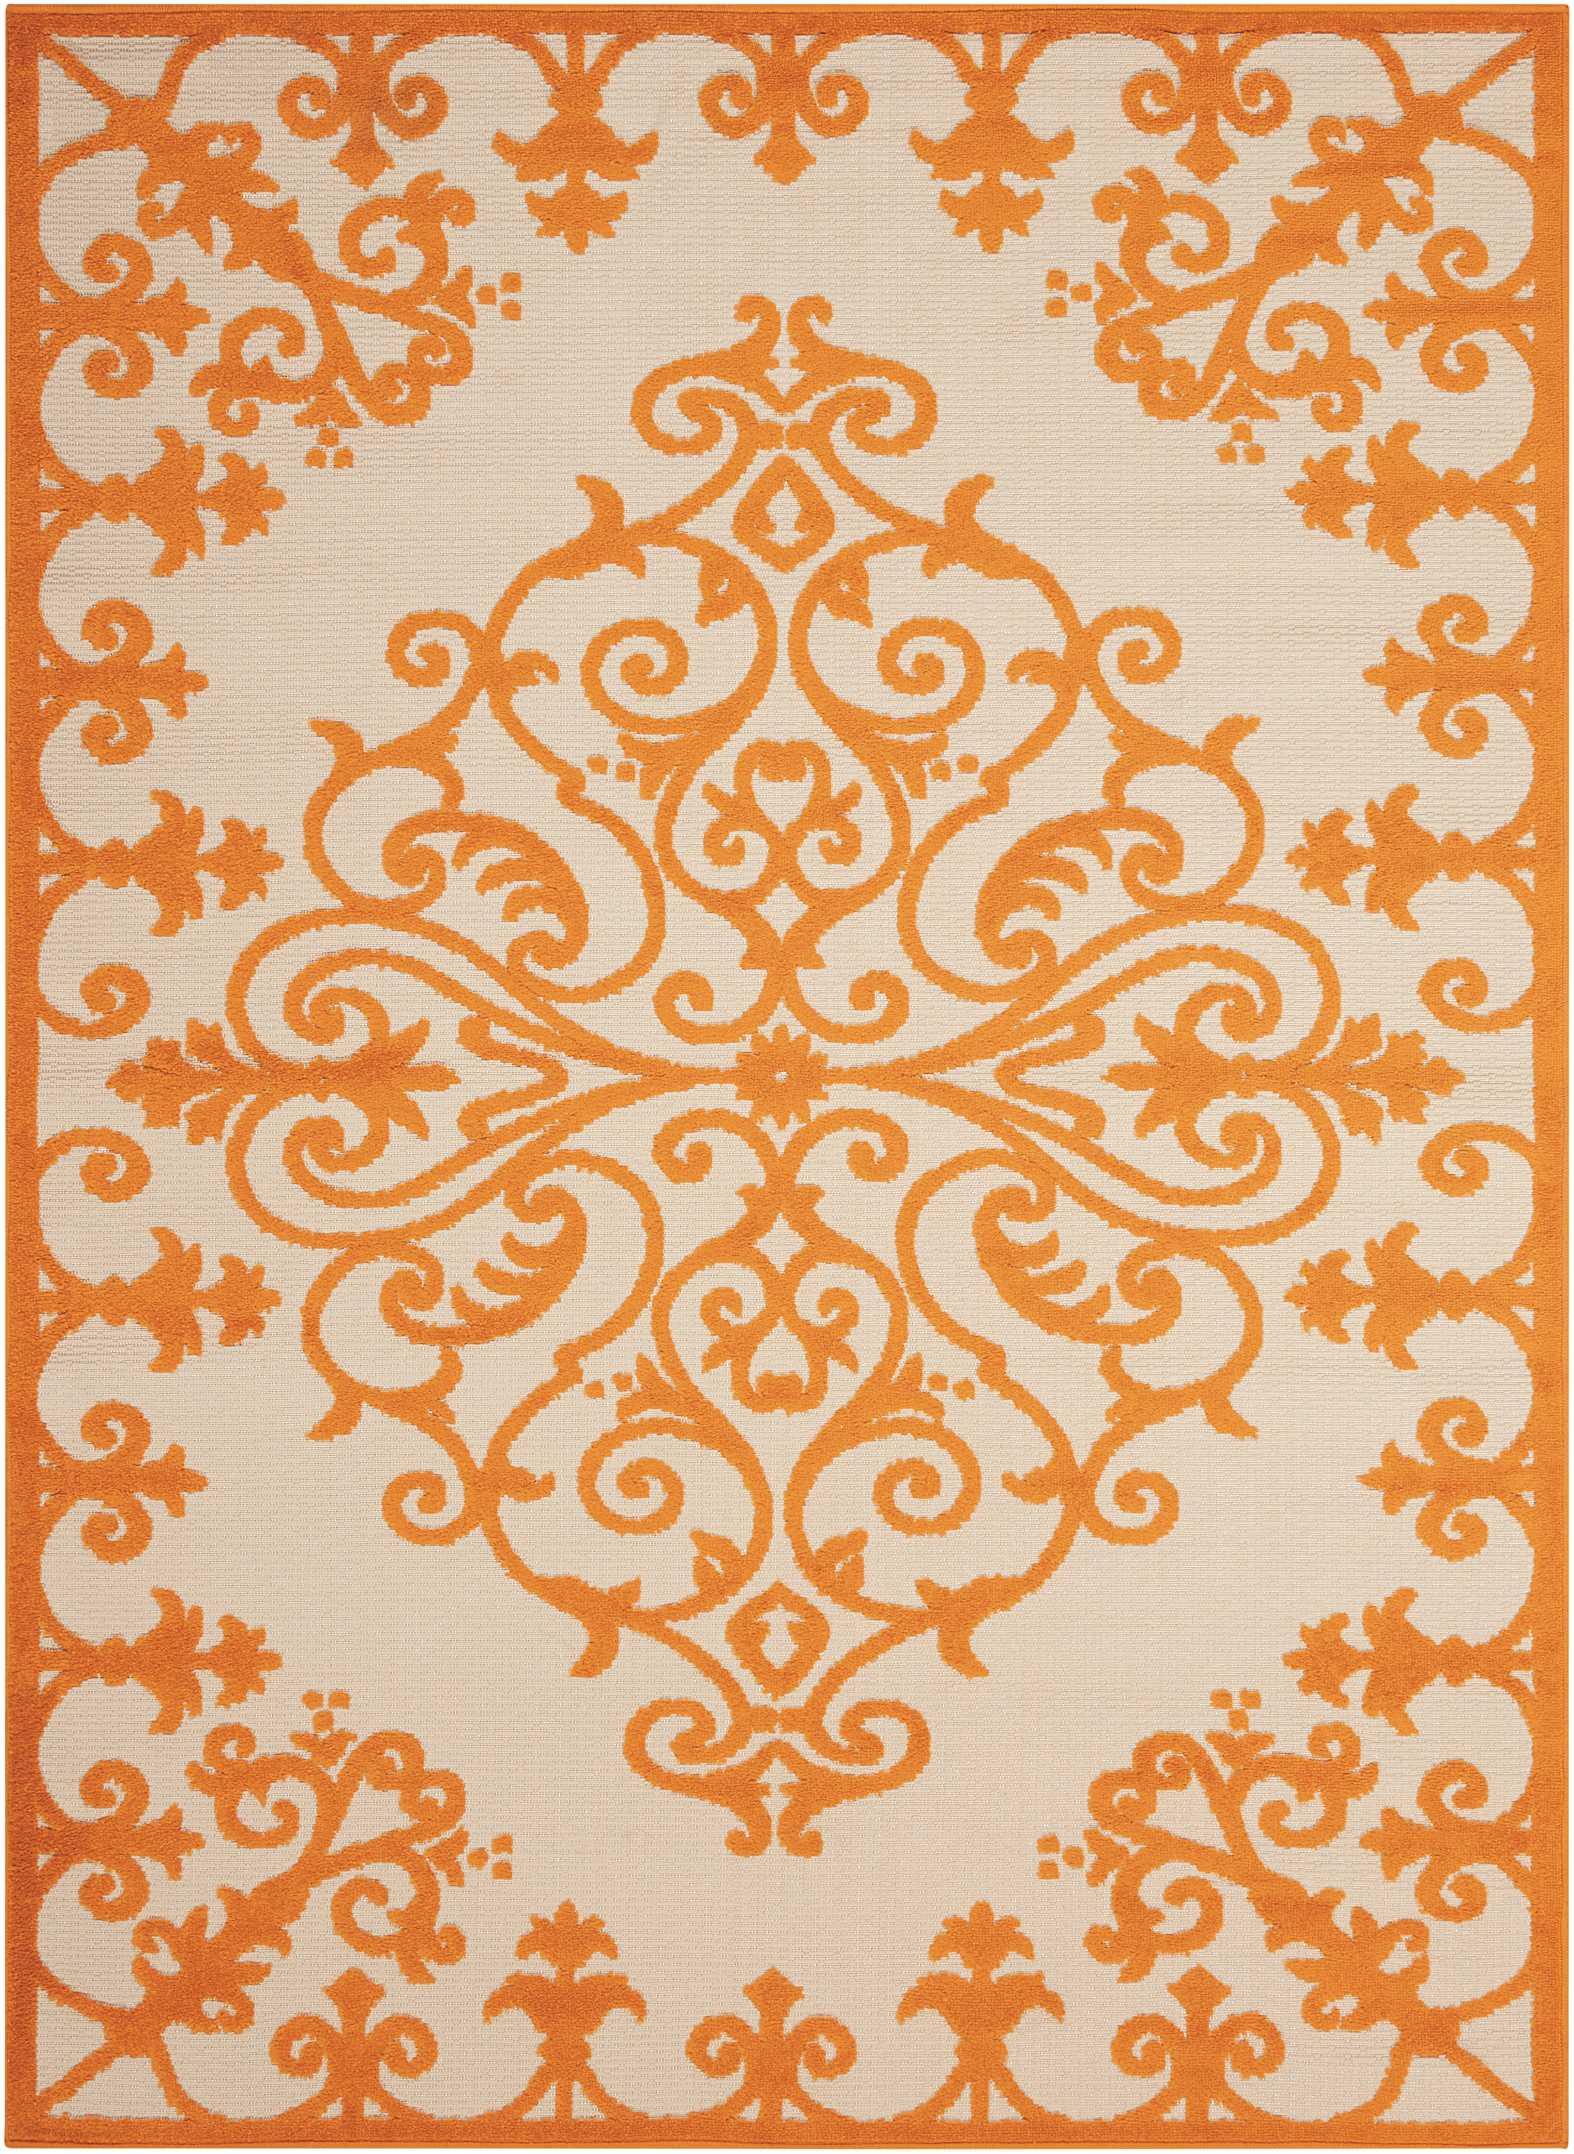 Nourison Aloha 5'X8' Orange And White Textured  Indoor-Outdoor Rug